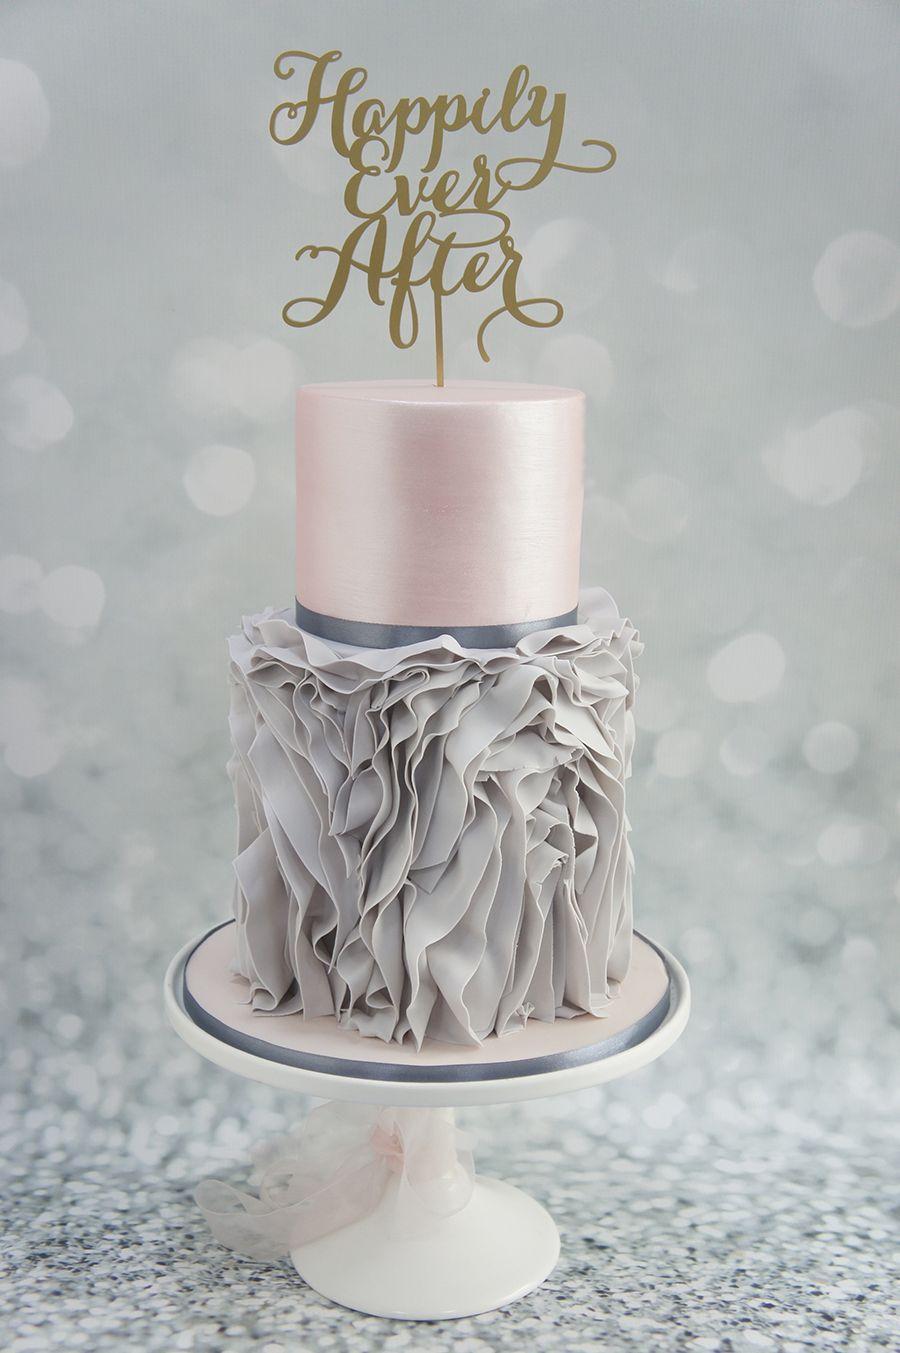 Top 10 Wedding Cake Creators in Malaysia - Part 2 | Pinterest ...